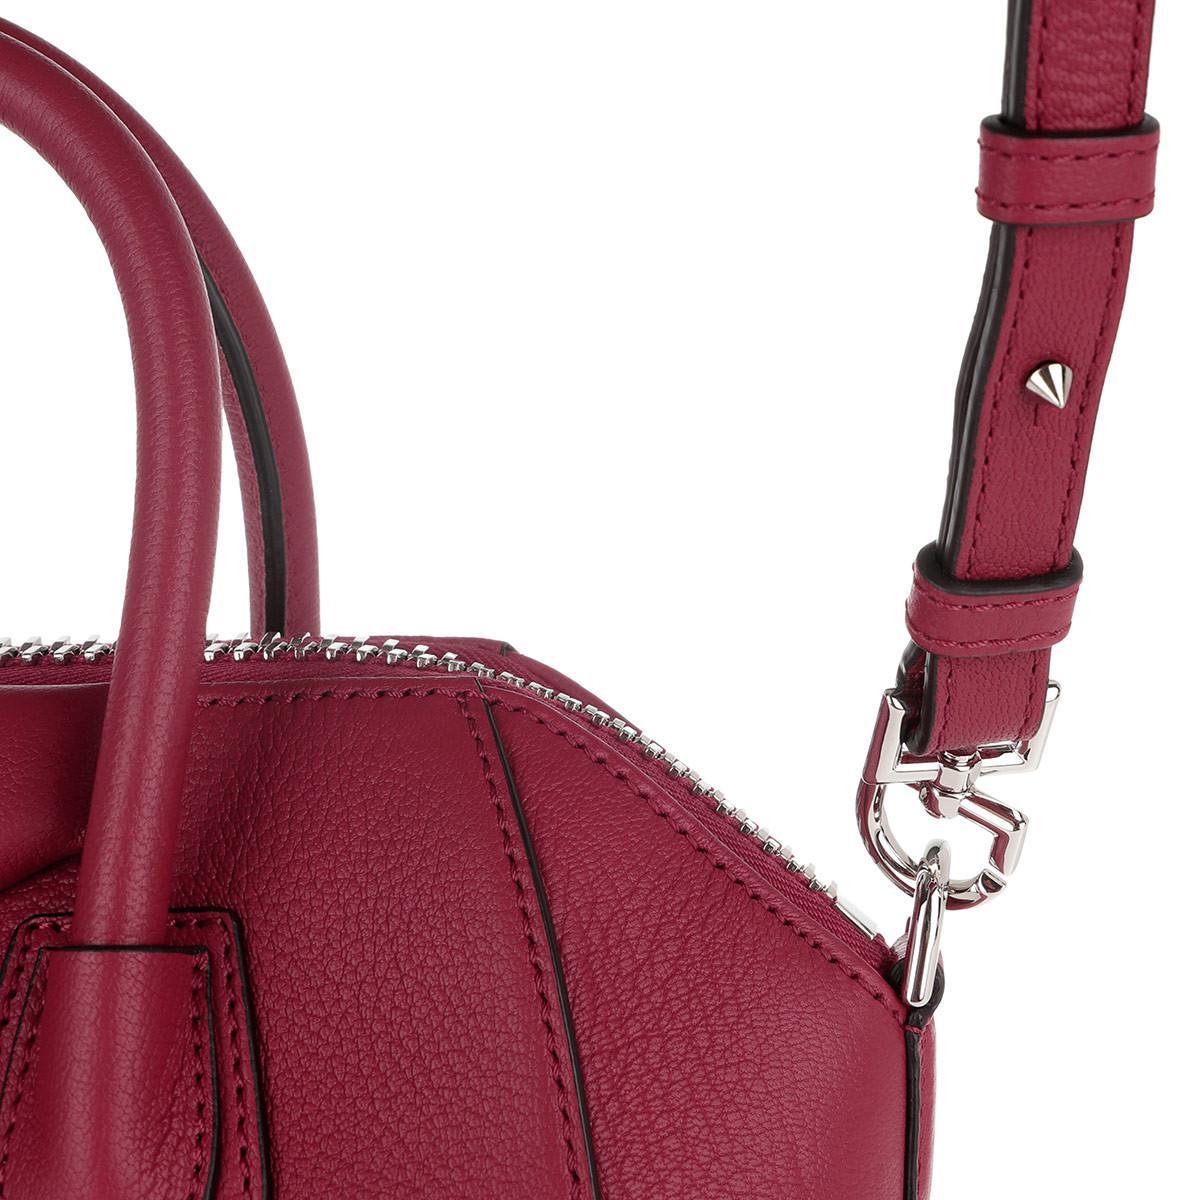 antigona mini borse pink fig givenchy Fd7wOF